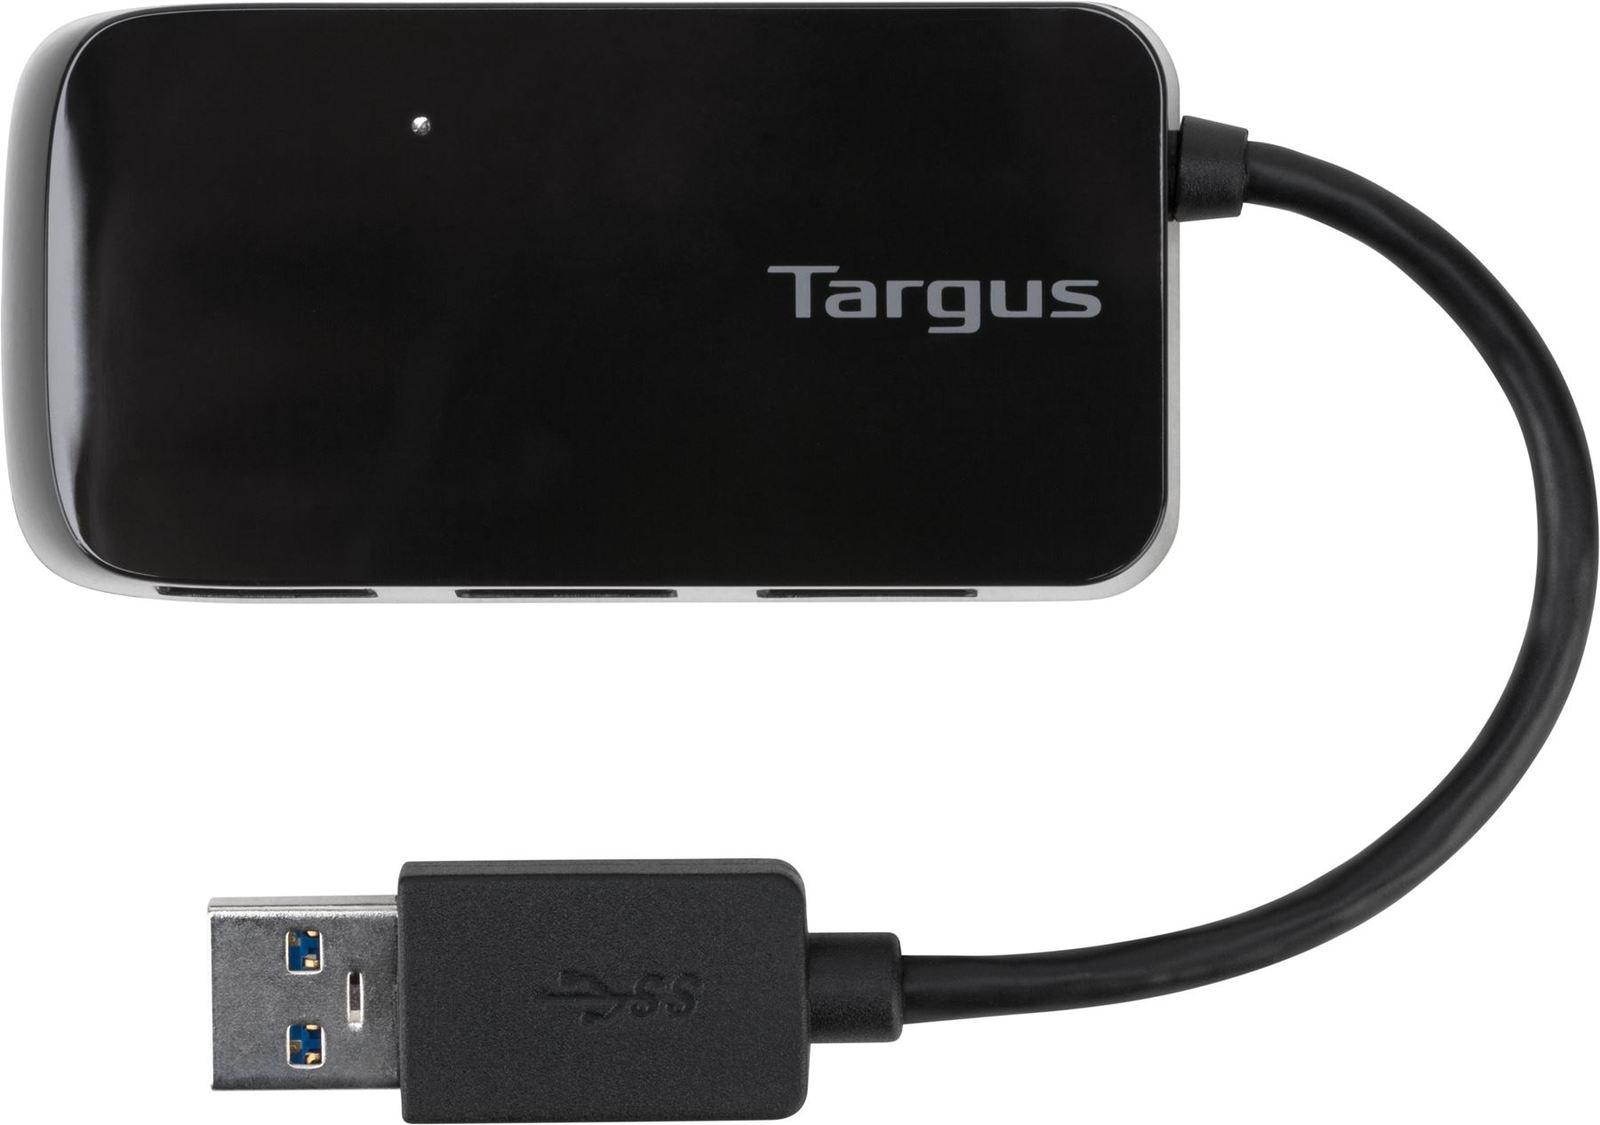 Targus: USB 3.0 4-Port Hub image